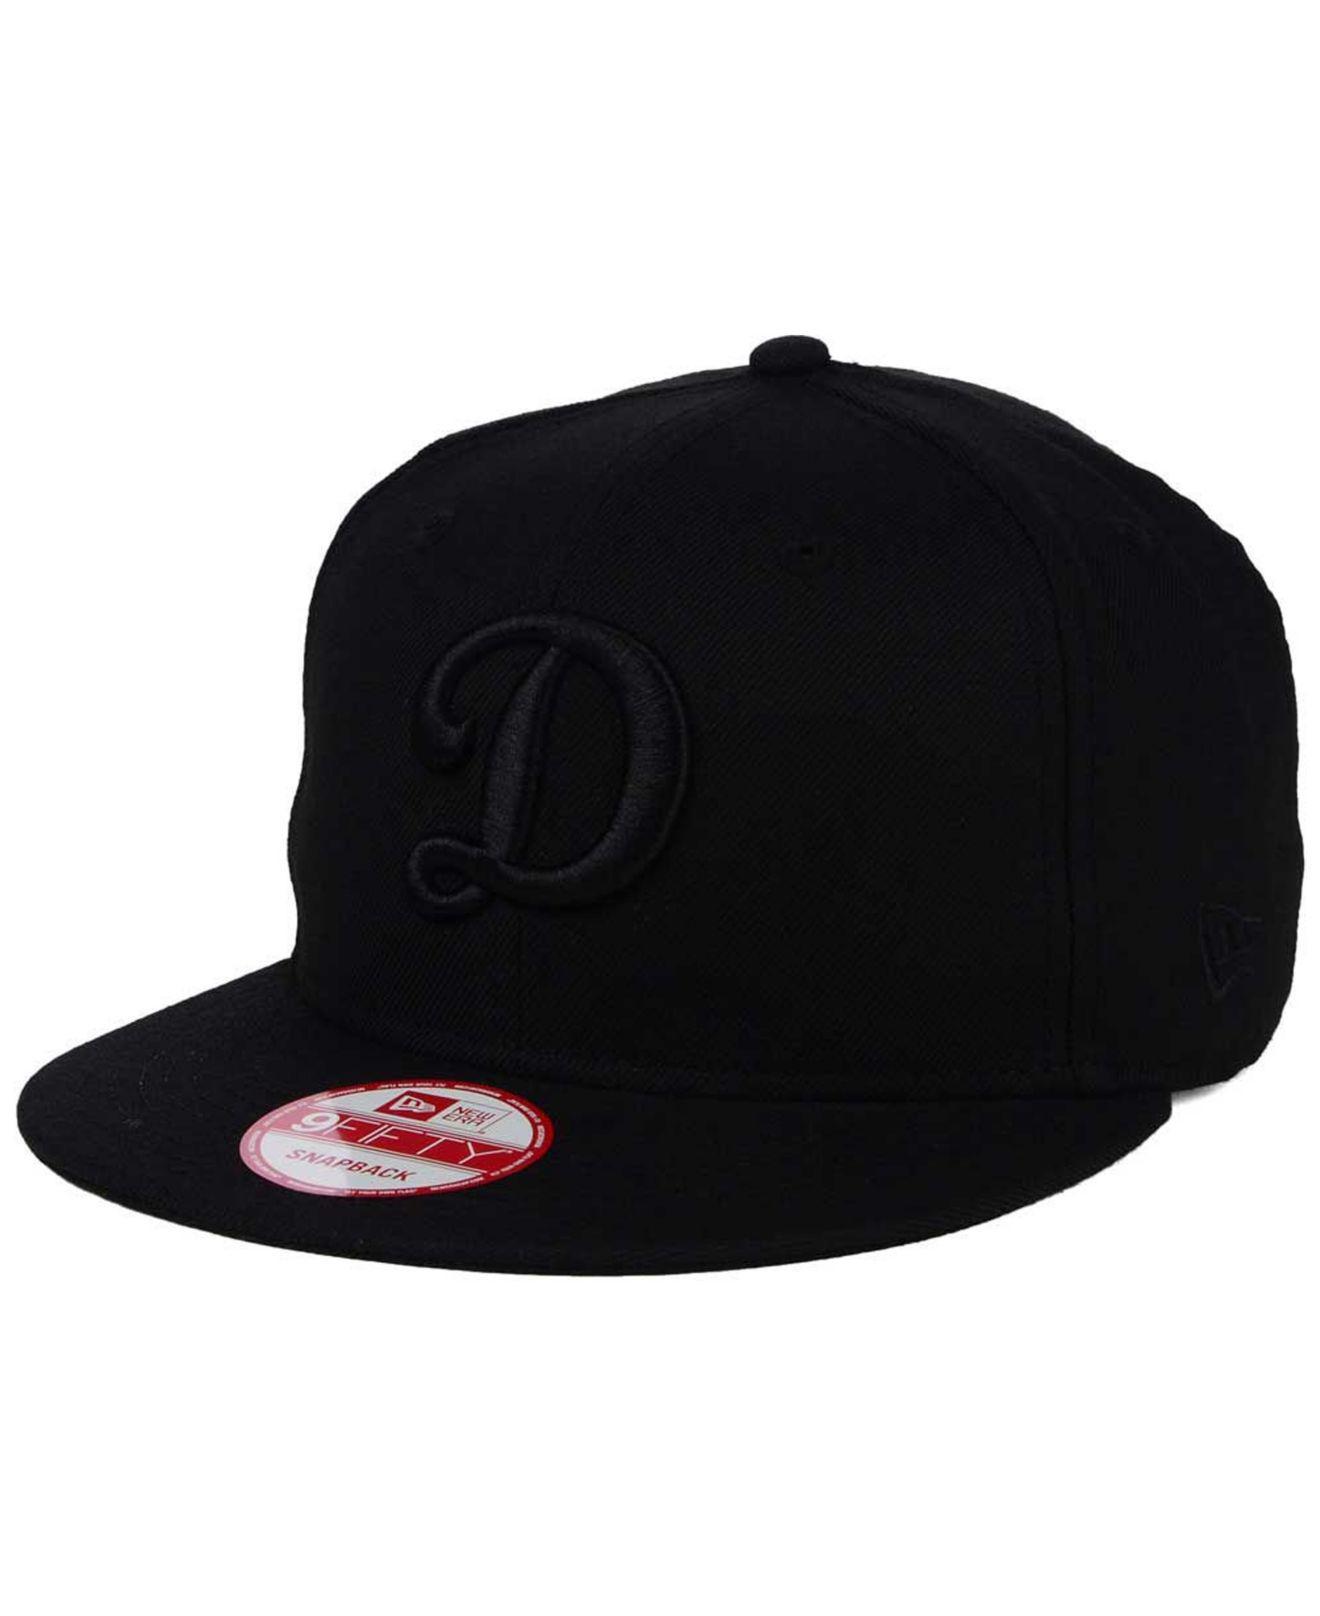 55ffd4a8b021a Lyst - KTZ Triple Black 9fifty Snapback Cap in Black for Men